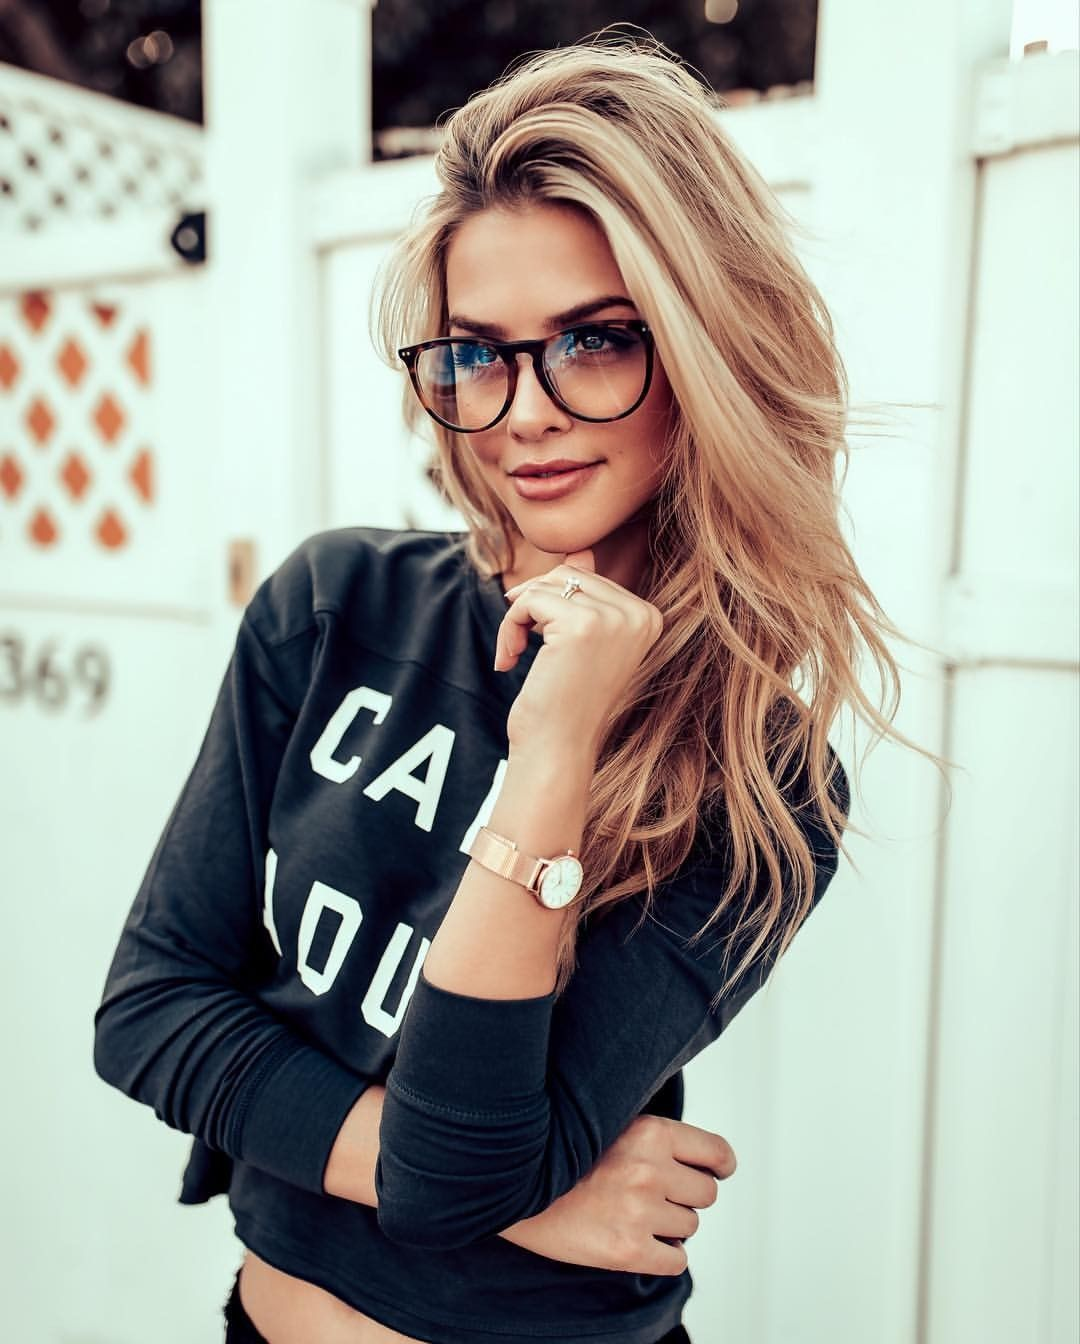 337a21935d Marina Laswick Women With Glasses